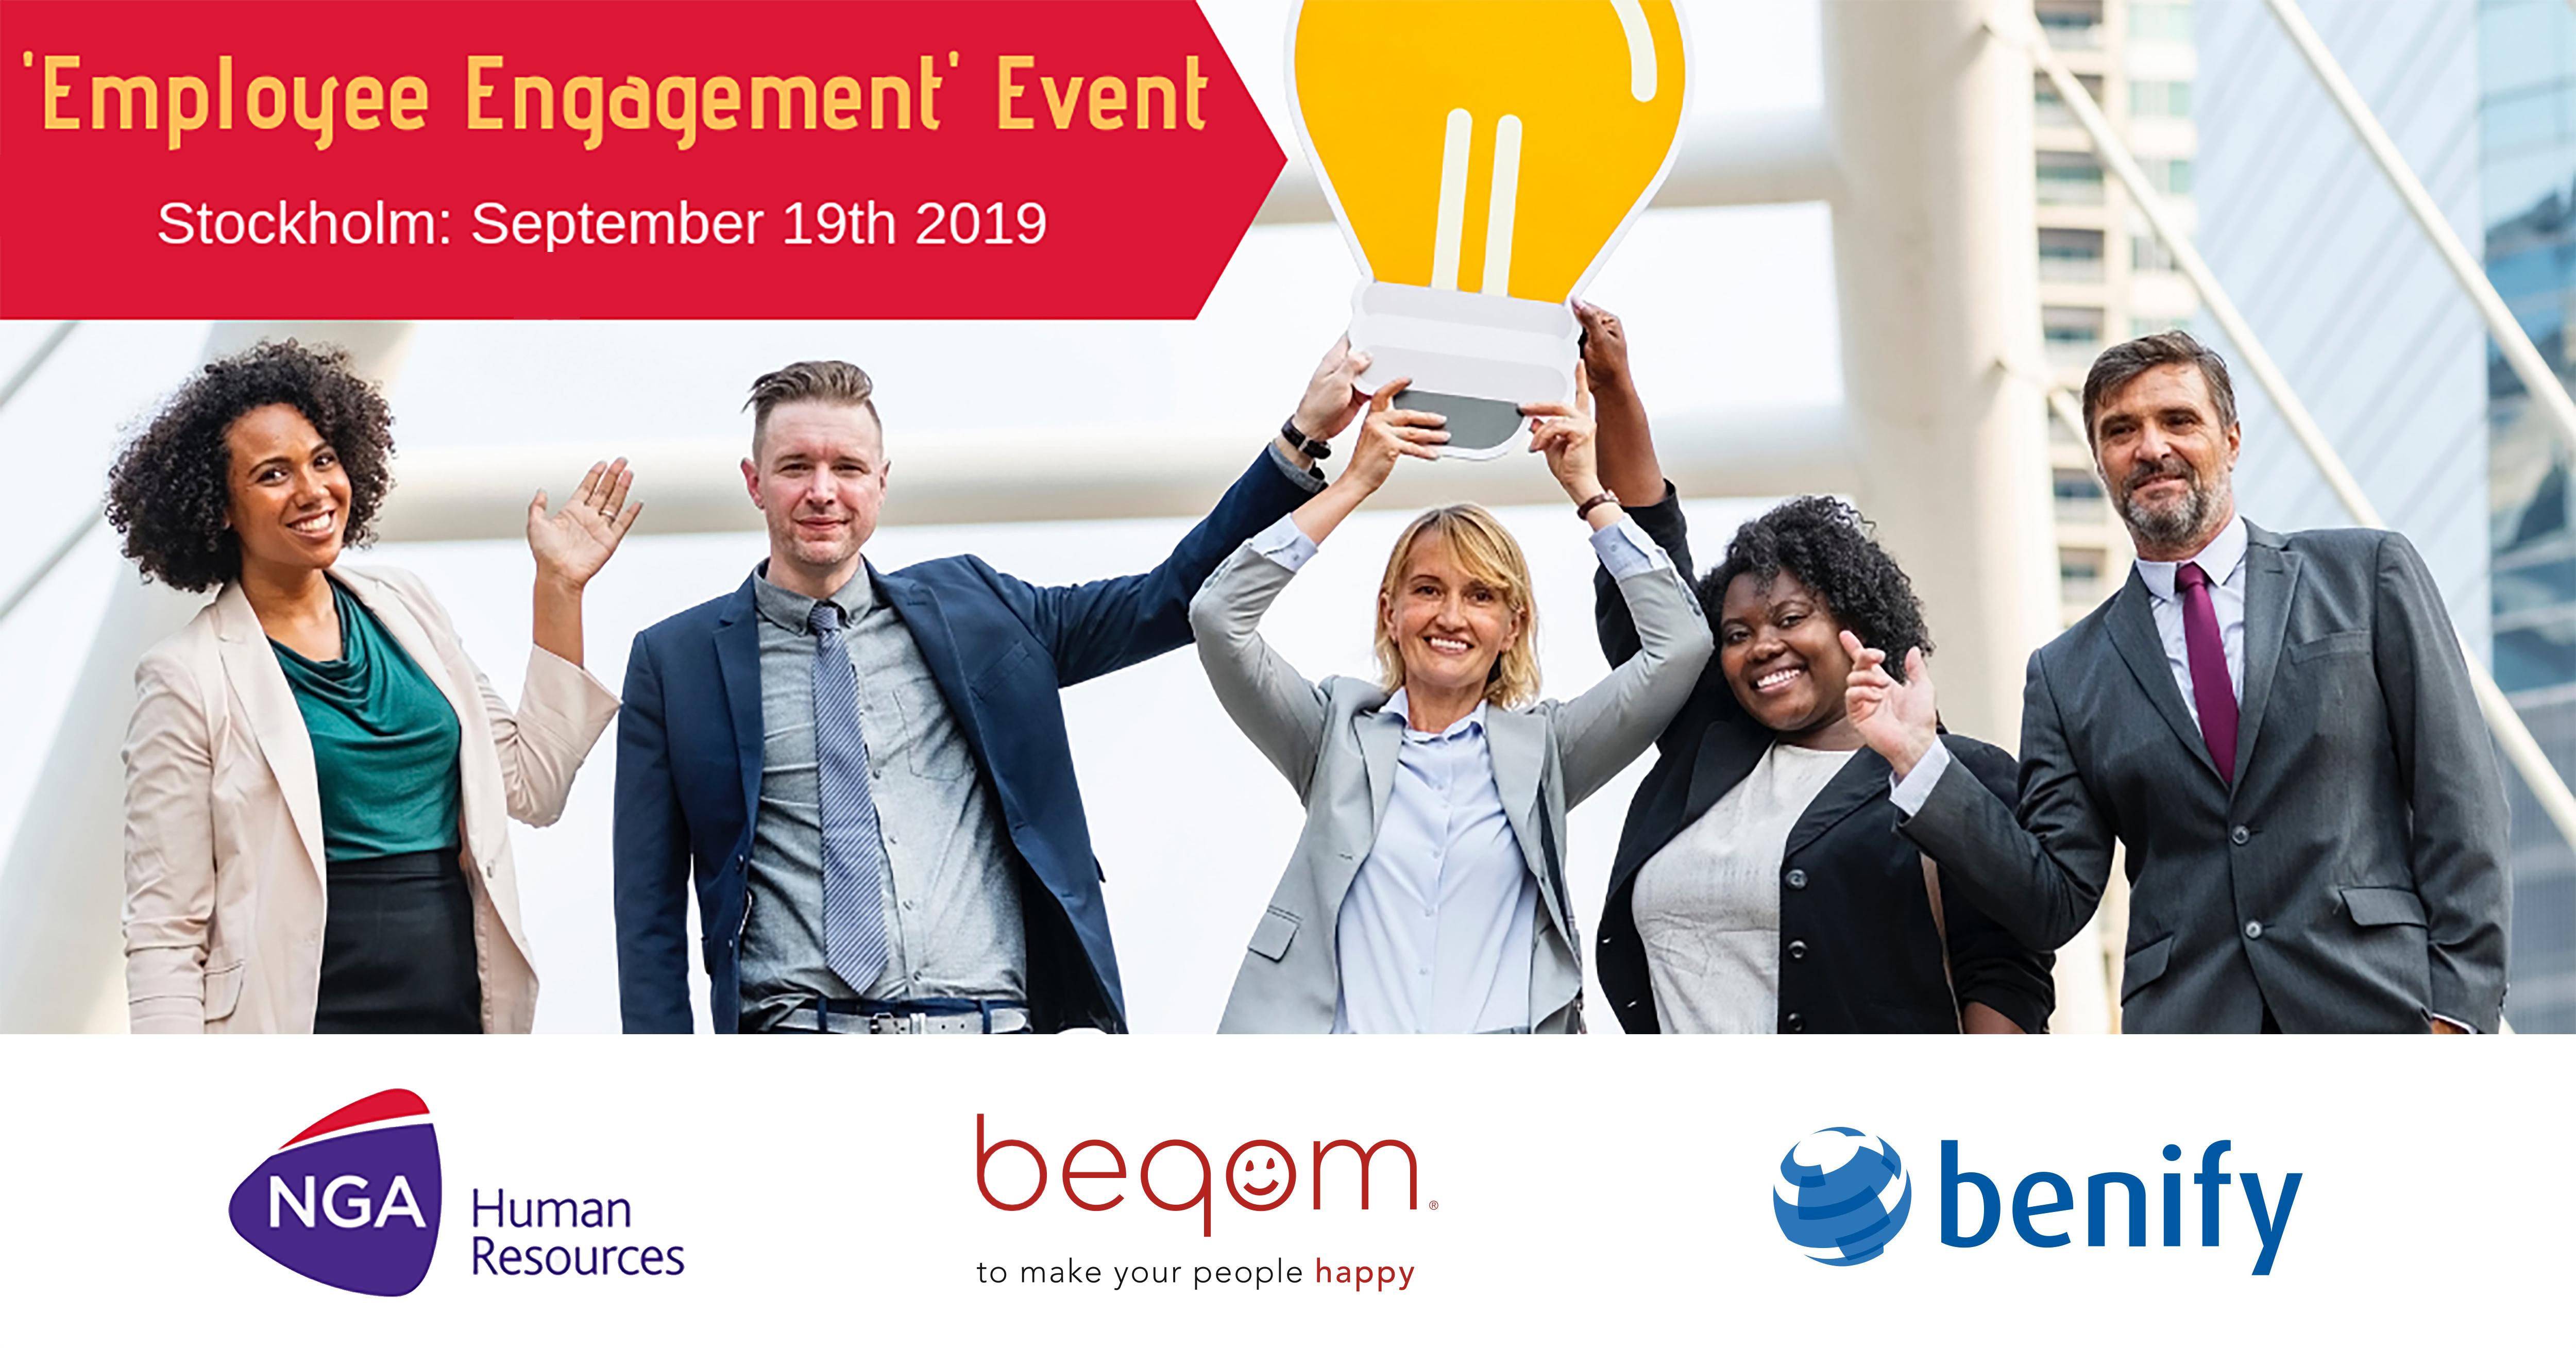 beqom-NGA-Benify Seminar Stockholm, Sept 2019